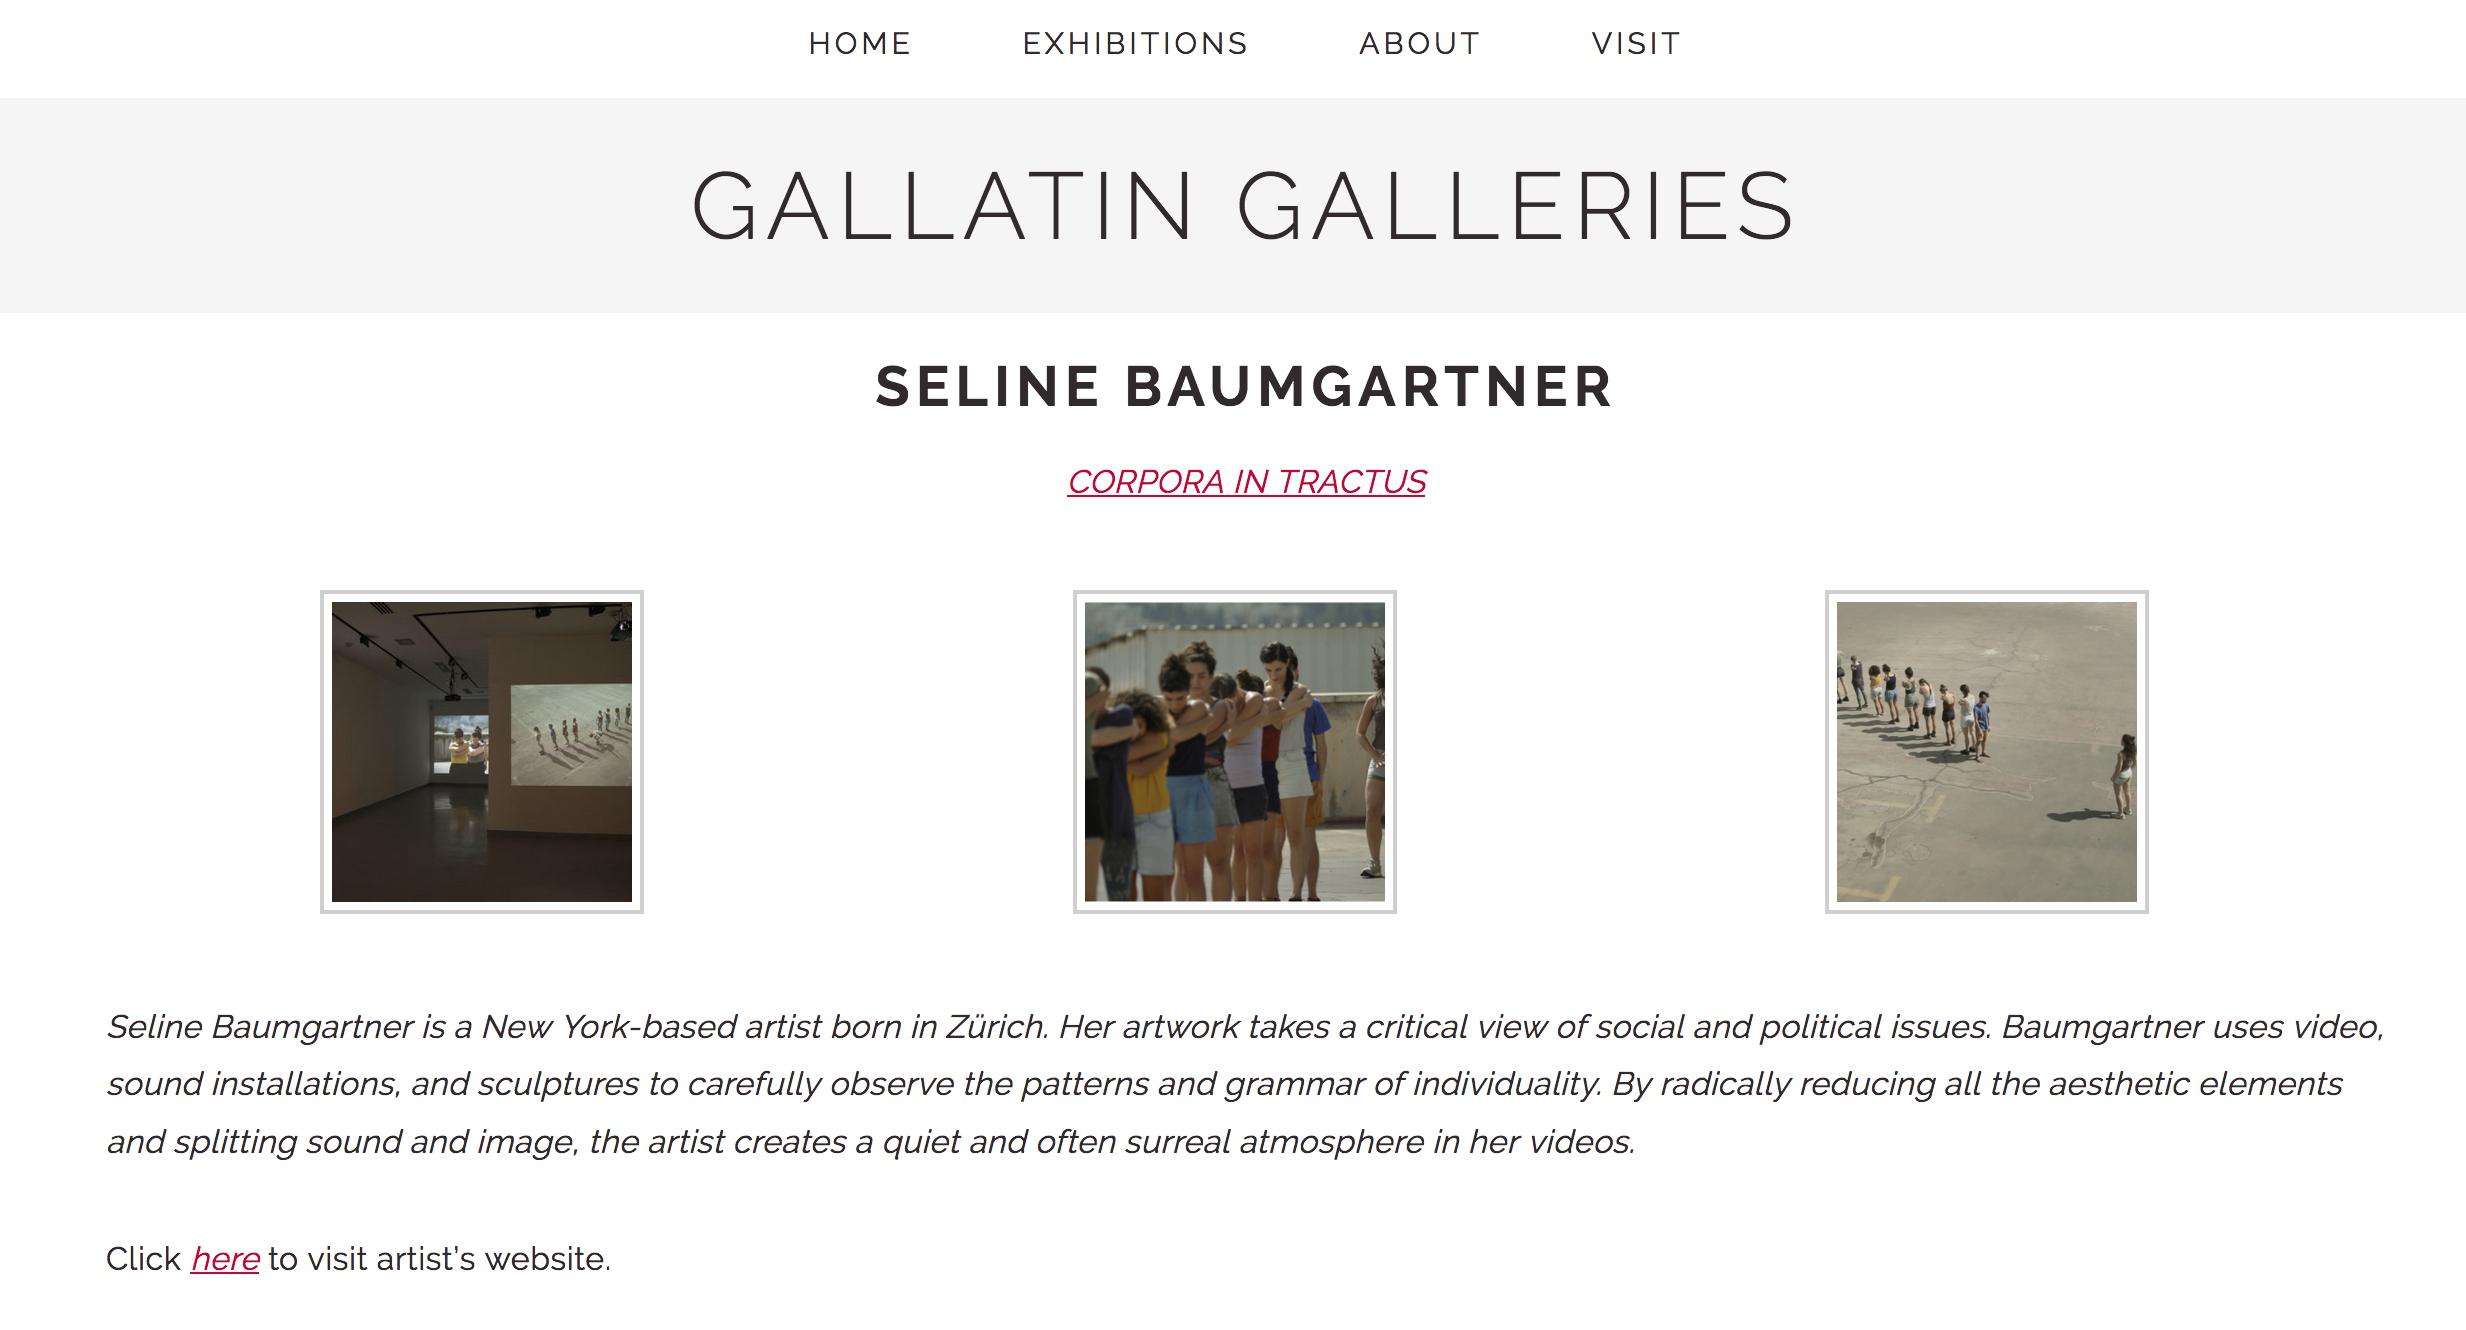 NYU Gallatin Galleries, New York Seline Baumgartner